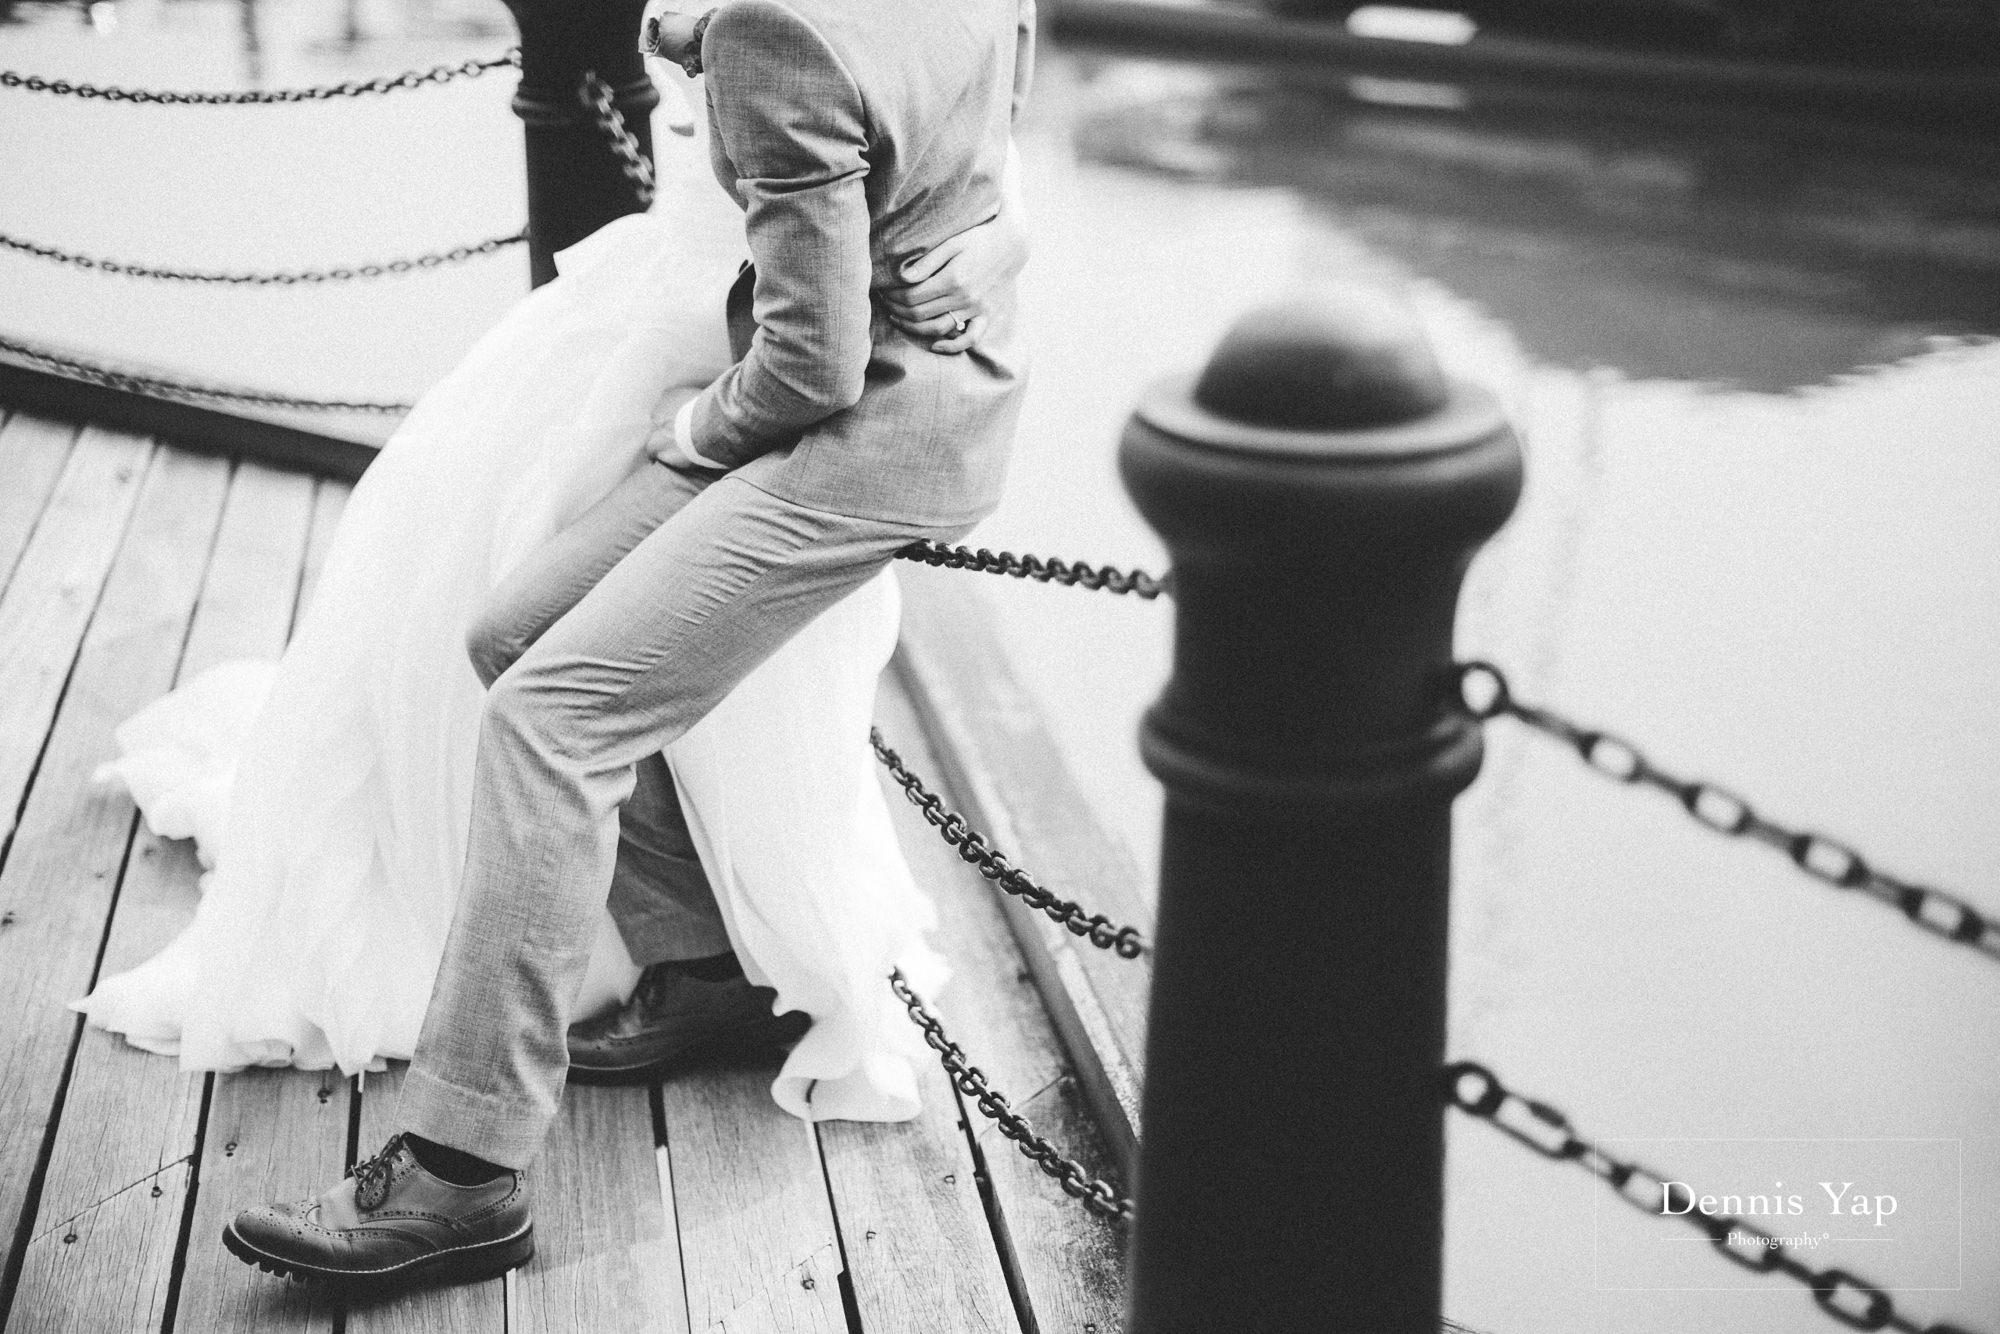 danny sherine wedding reception registration of marriage yacht fun beloved sea dennis yap photography malaysia top wedding photographer-5.jpg